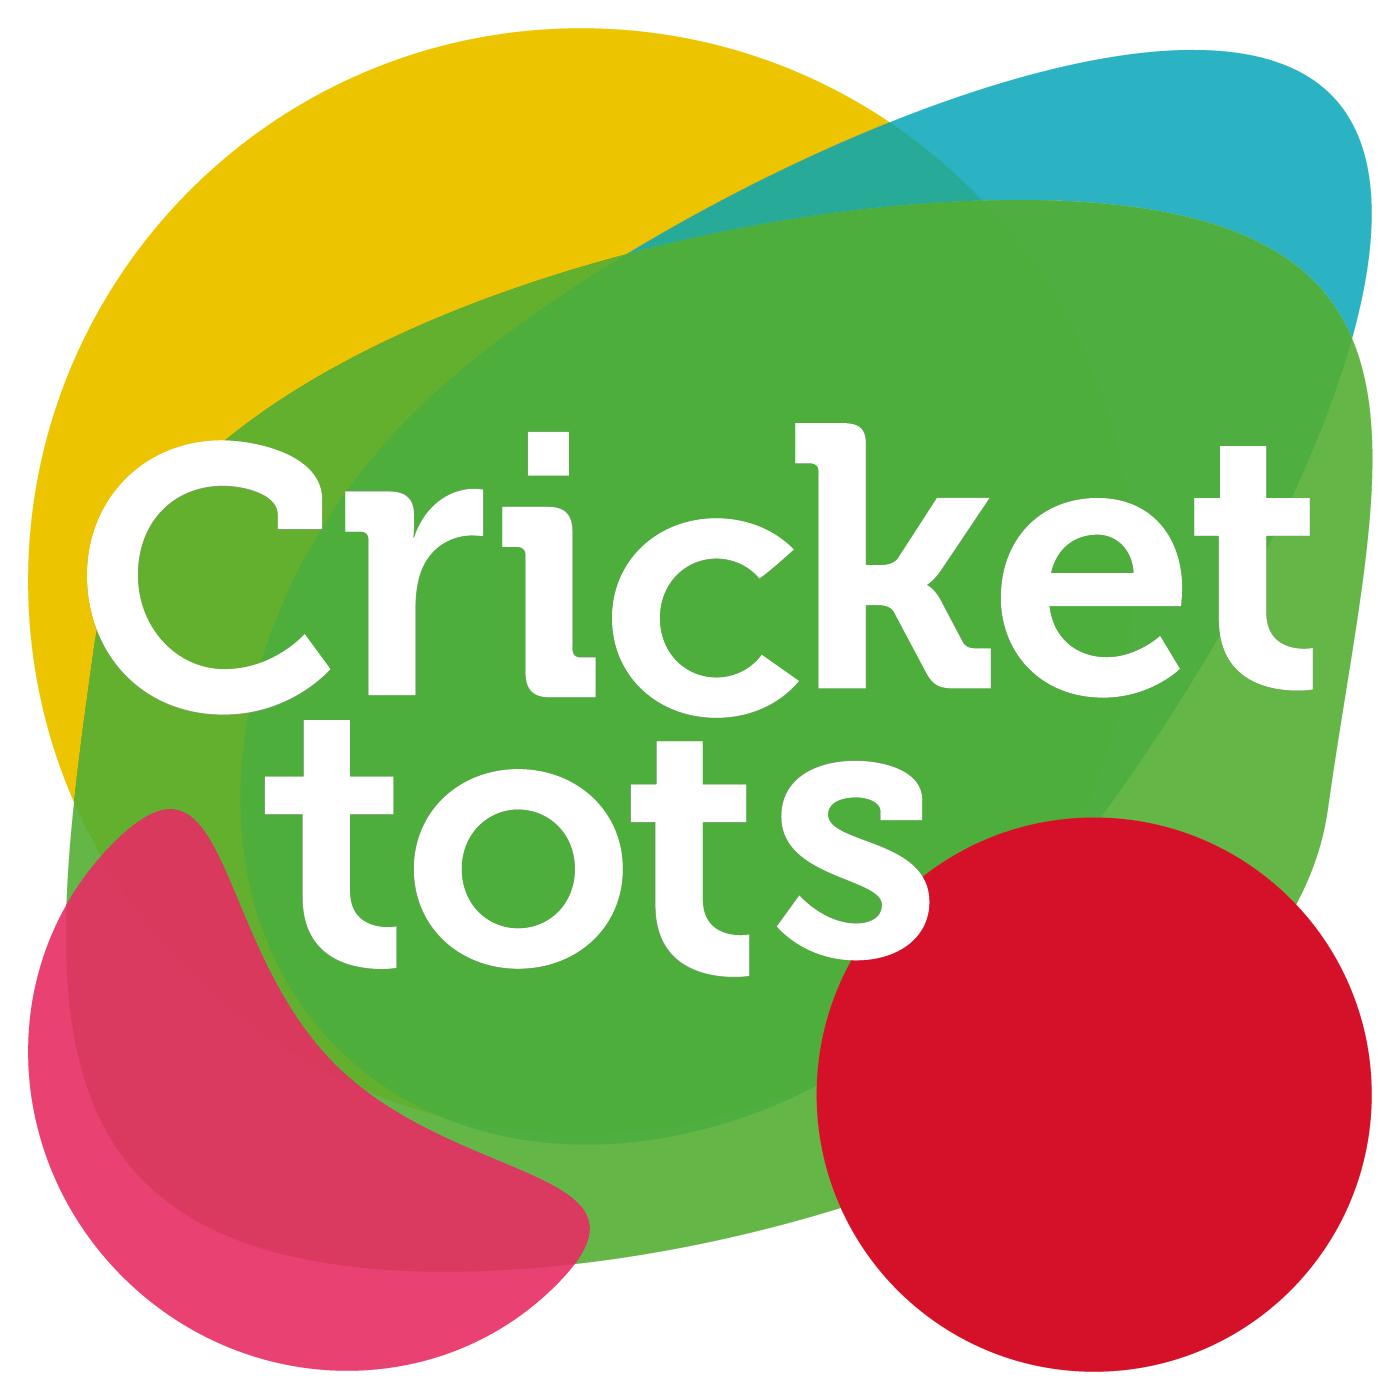 Cricket tots Suffolk's logo